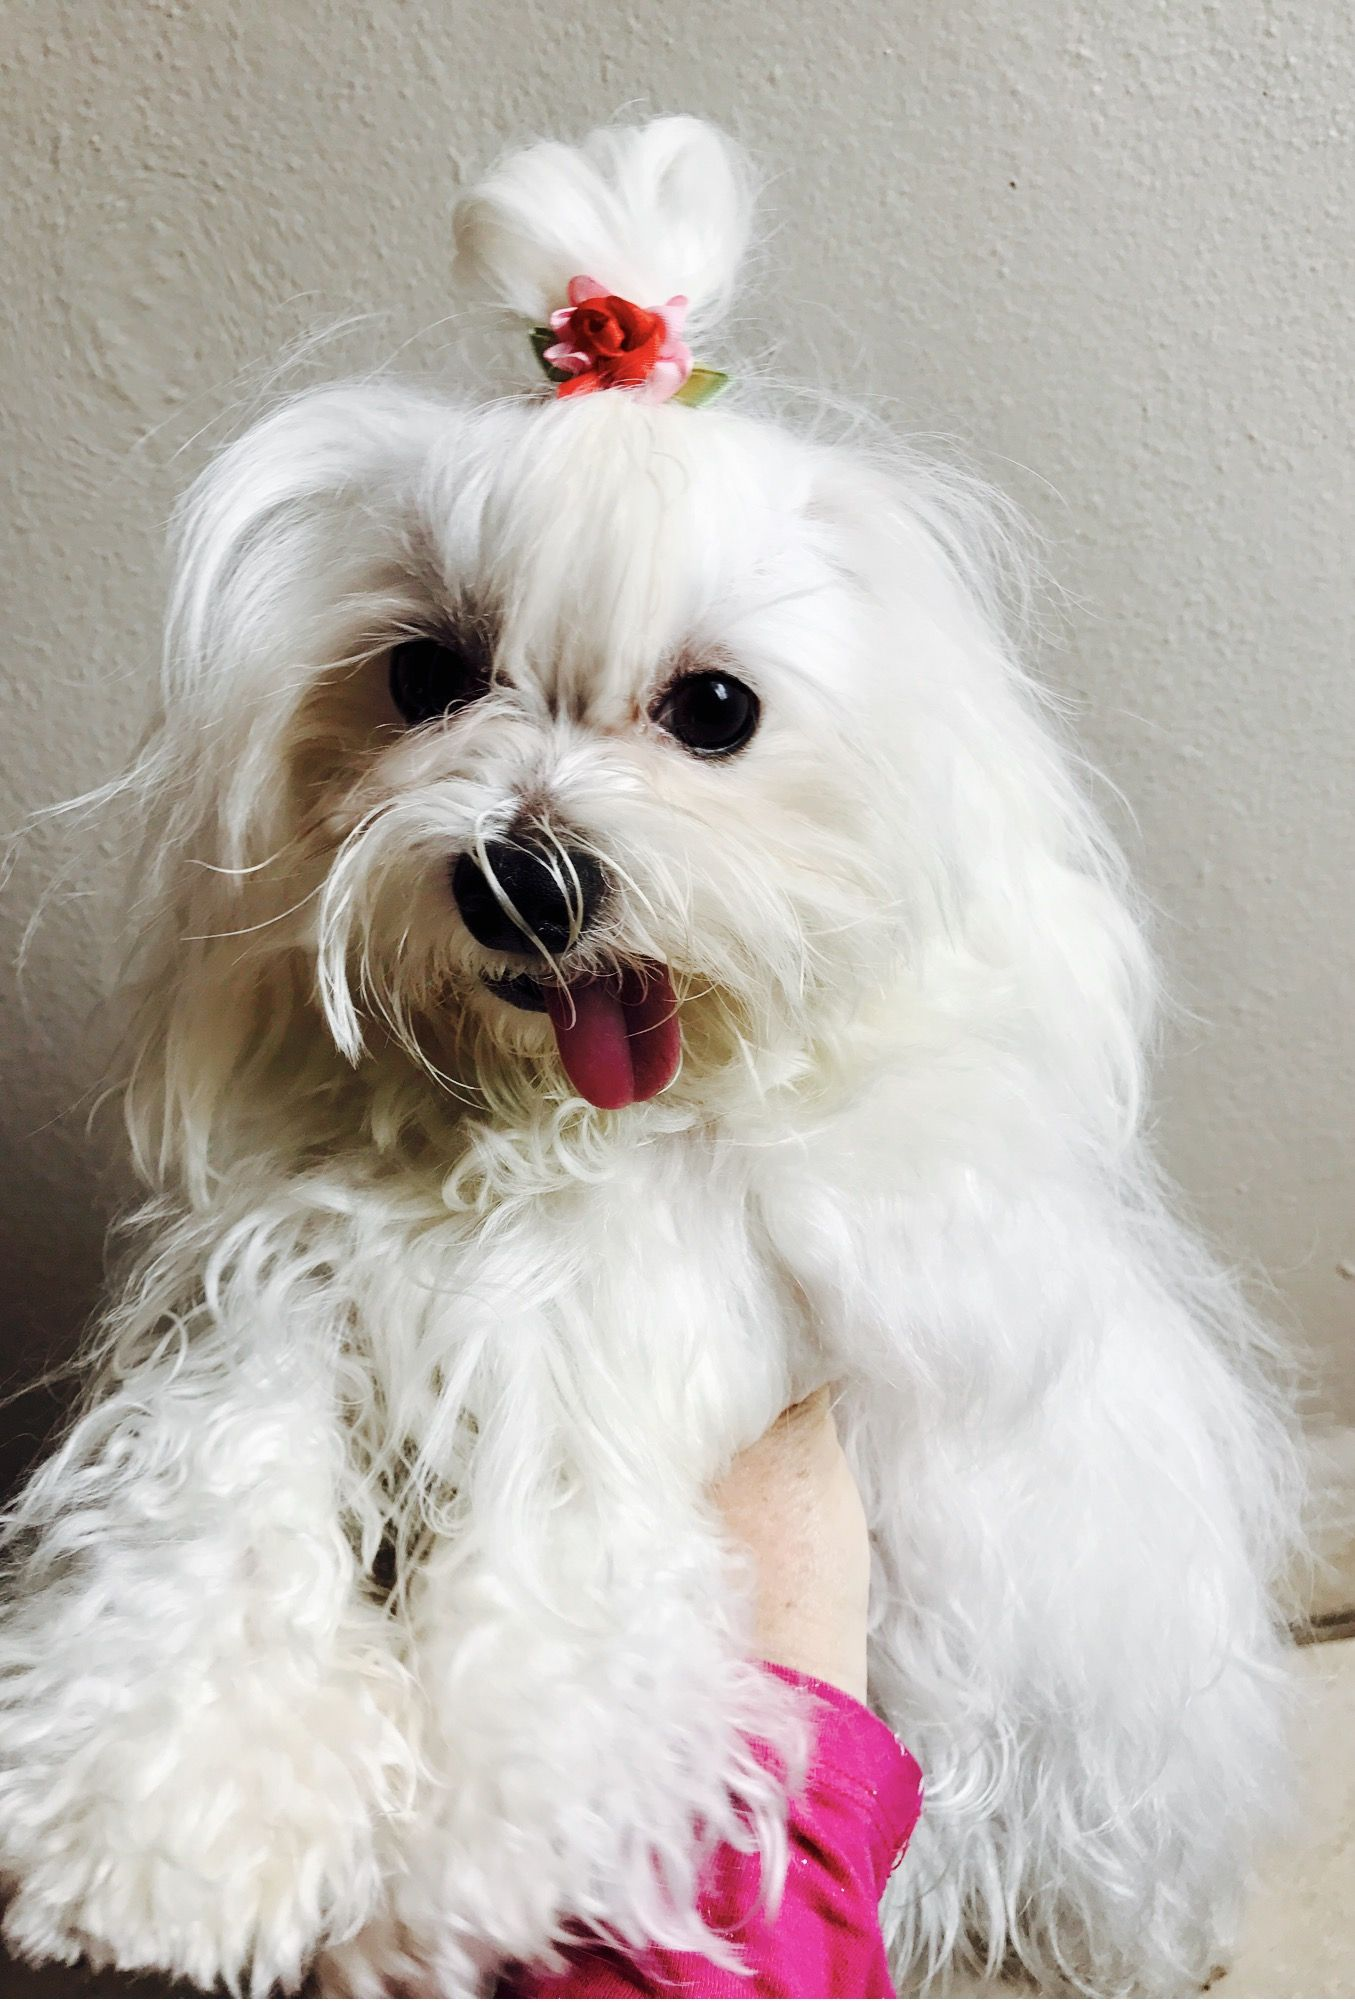 Pin By Sasha Maltese Toy On Sasha Maltese Toy Animals Maltese Dogs